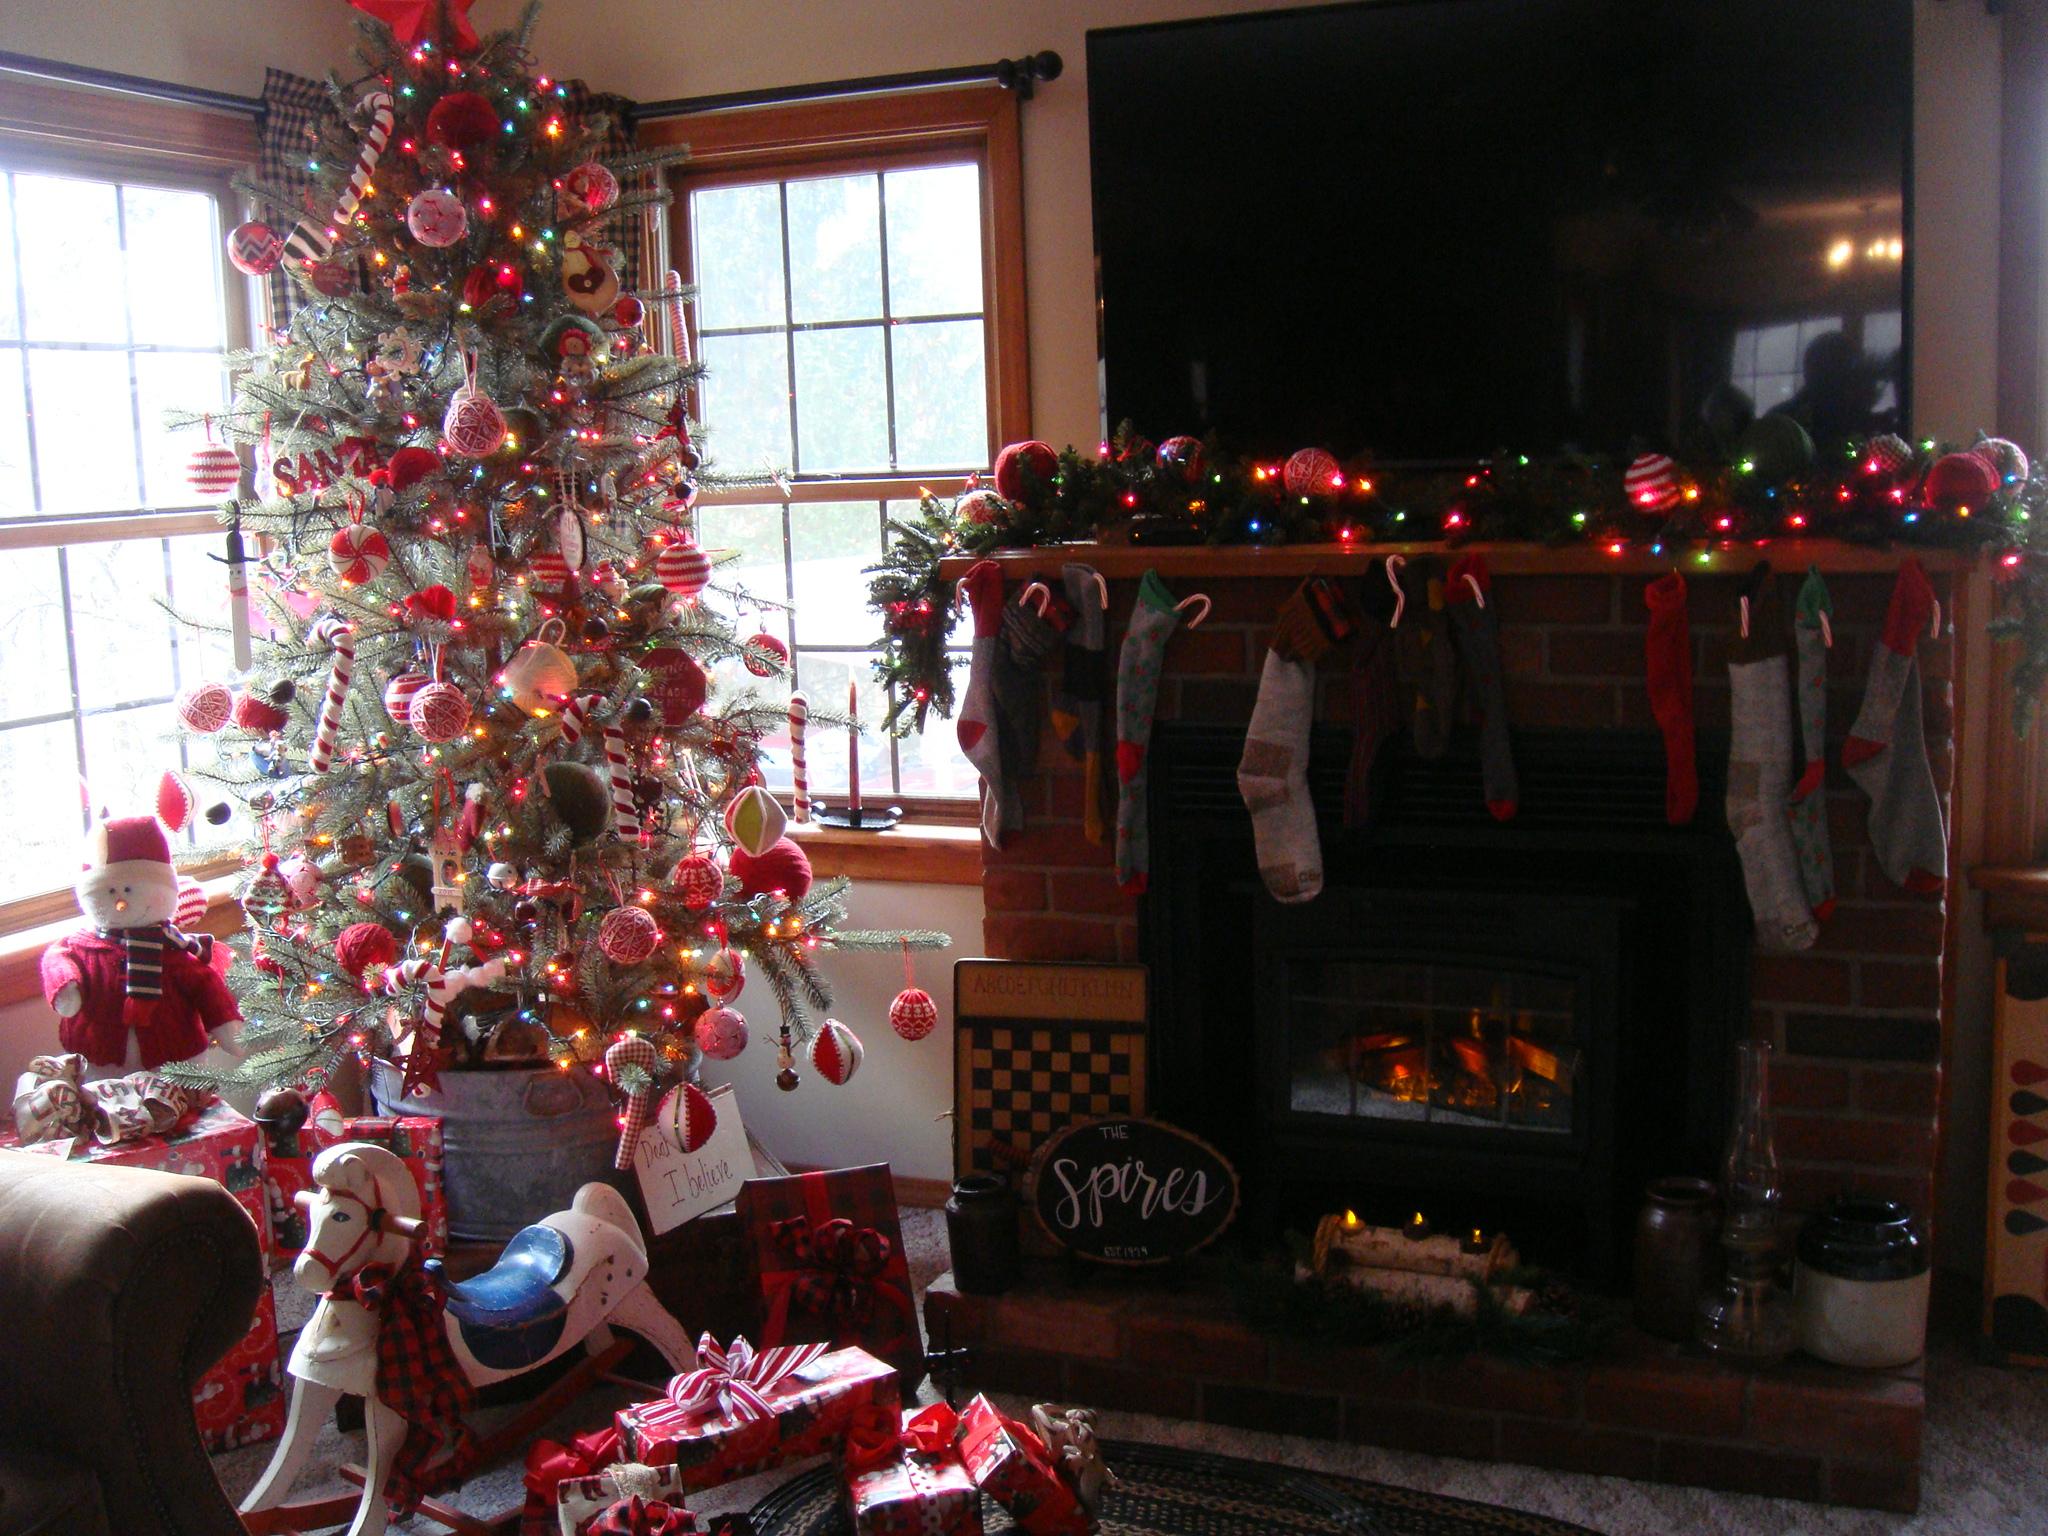 Spire's Home 2018 Christmas Tree